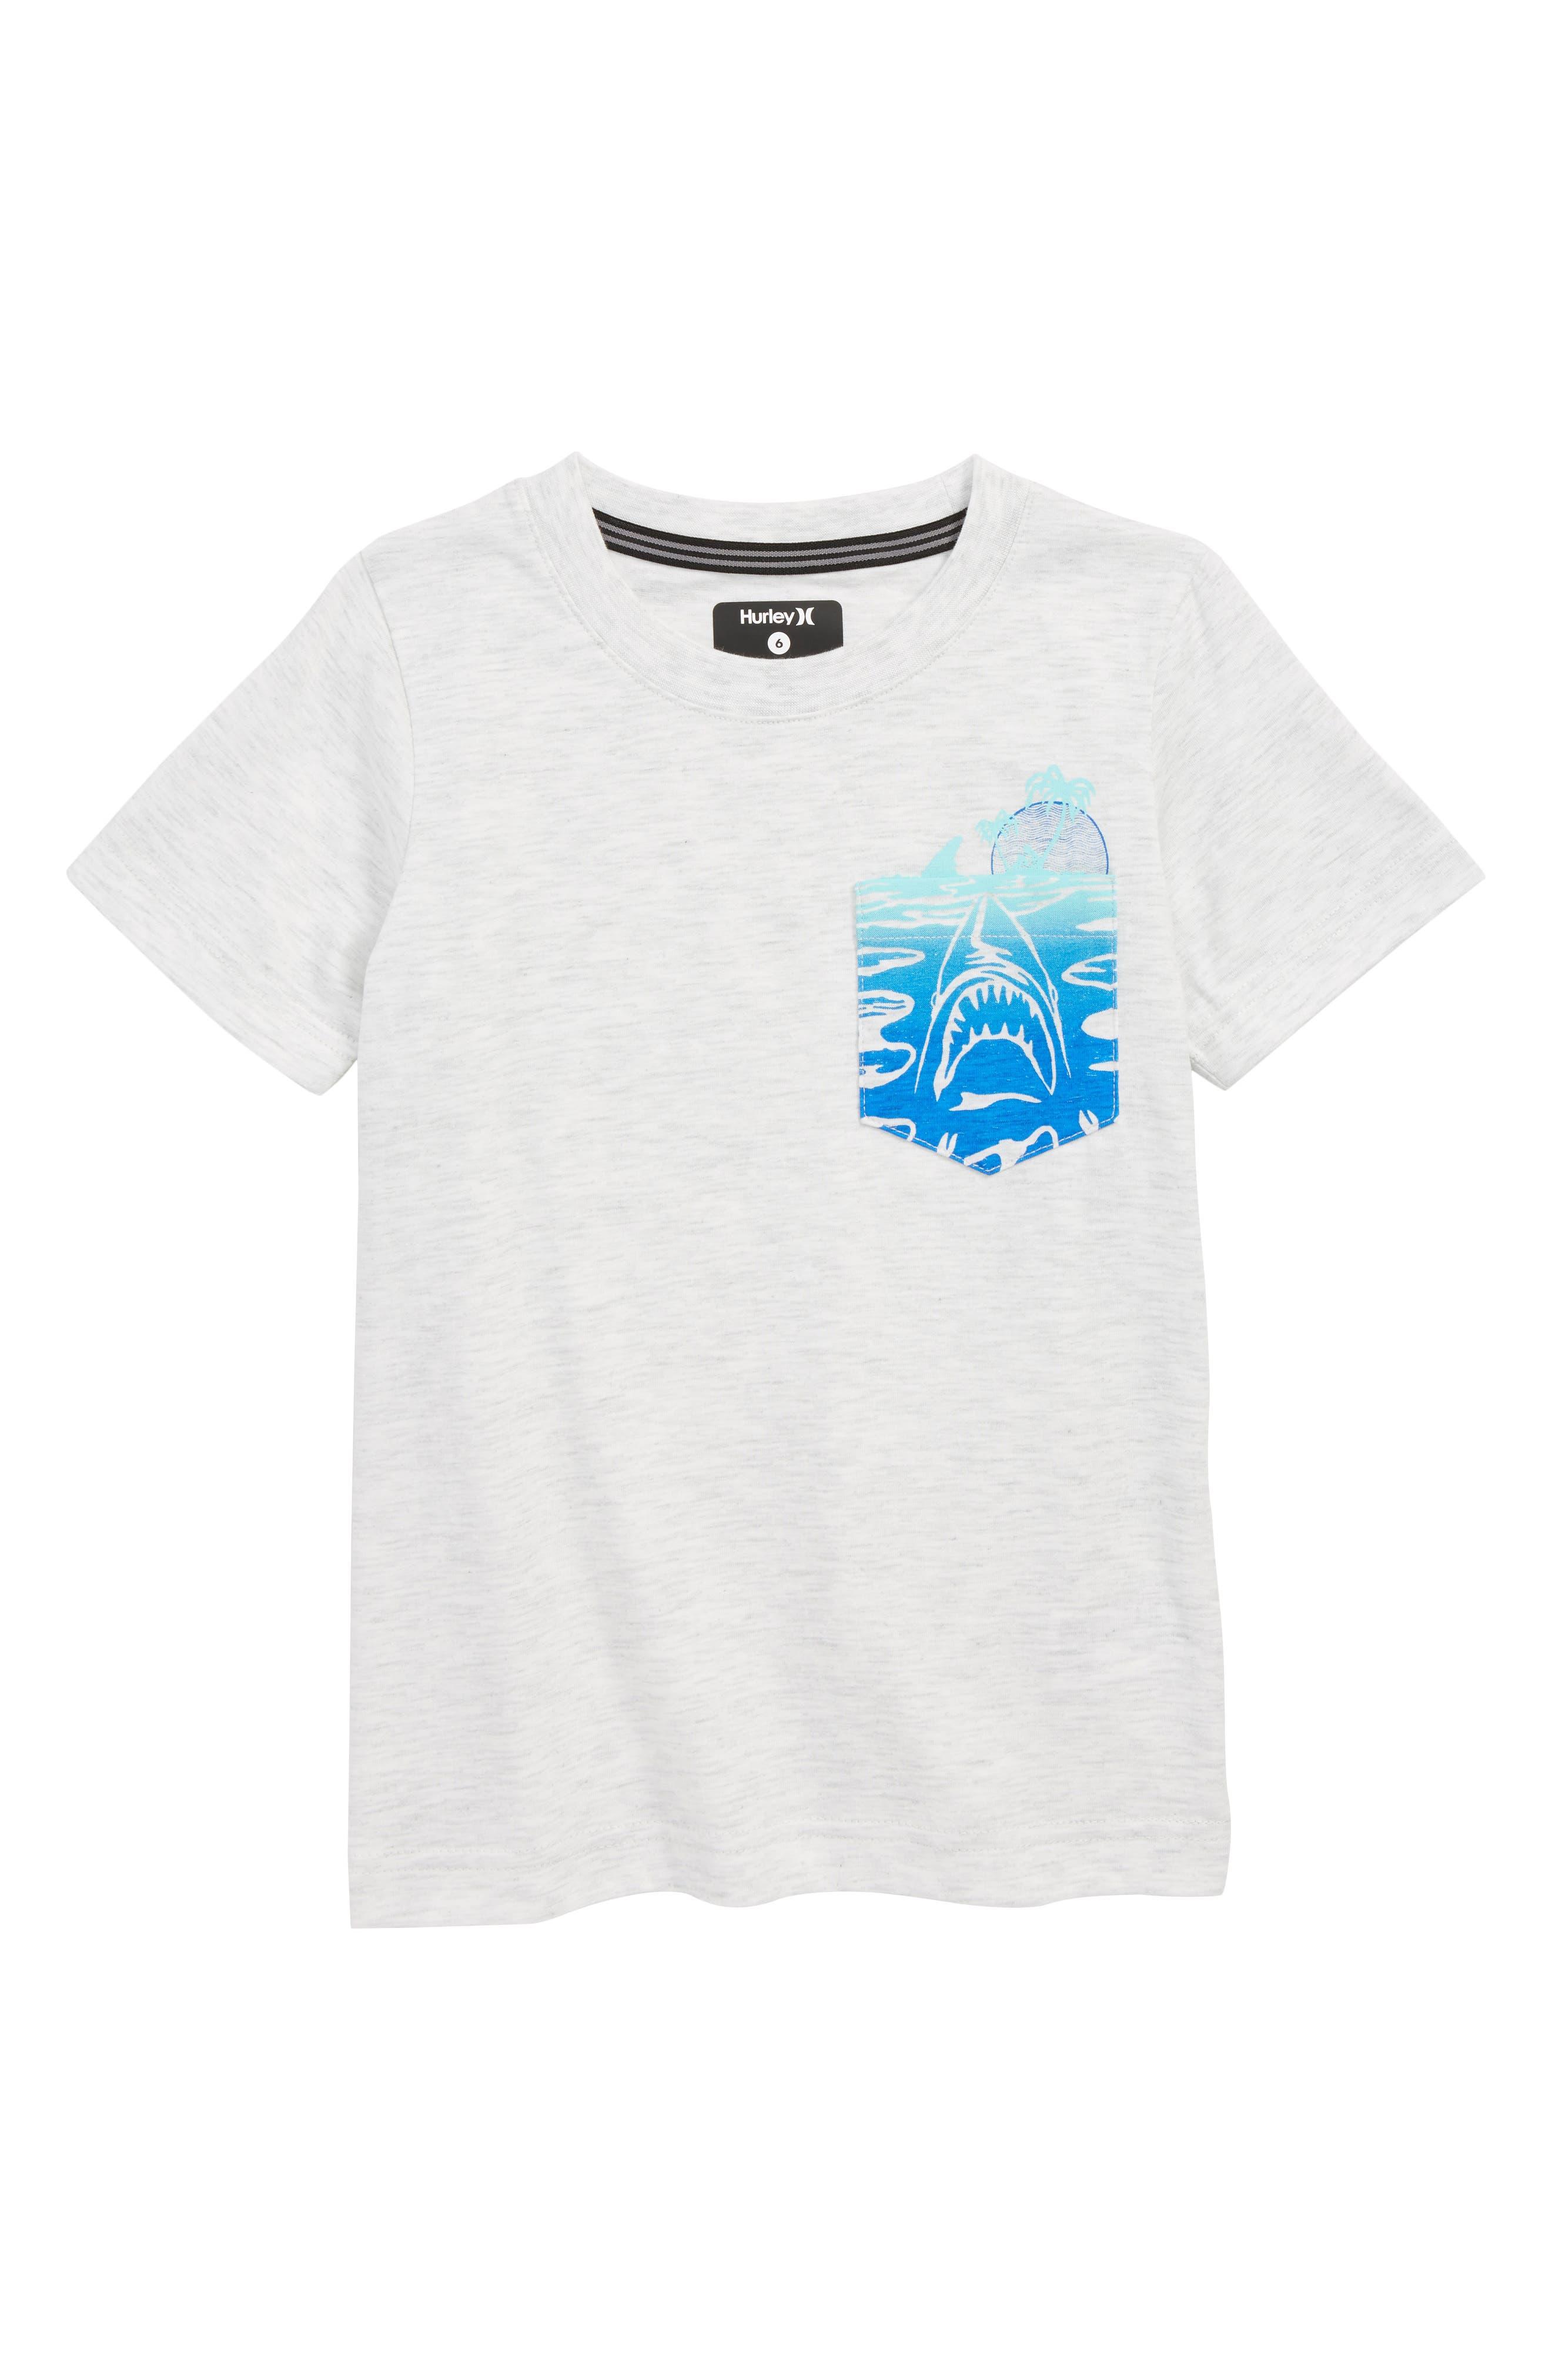 'Pocket Play' Screenprint T-Shirt,                             Main thumbnail 1, color,                             BIRCH HEATHER